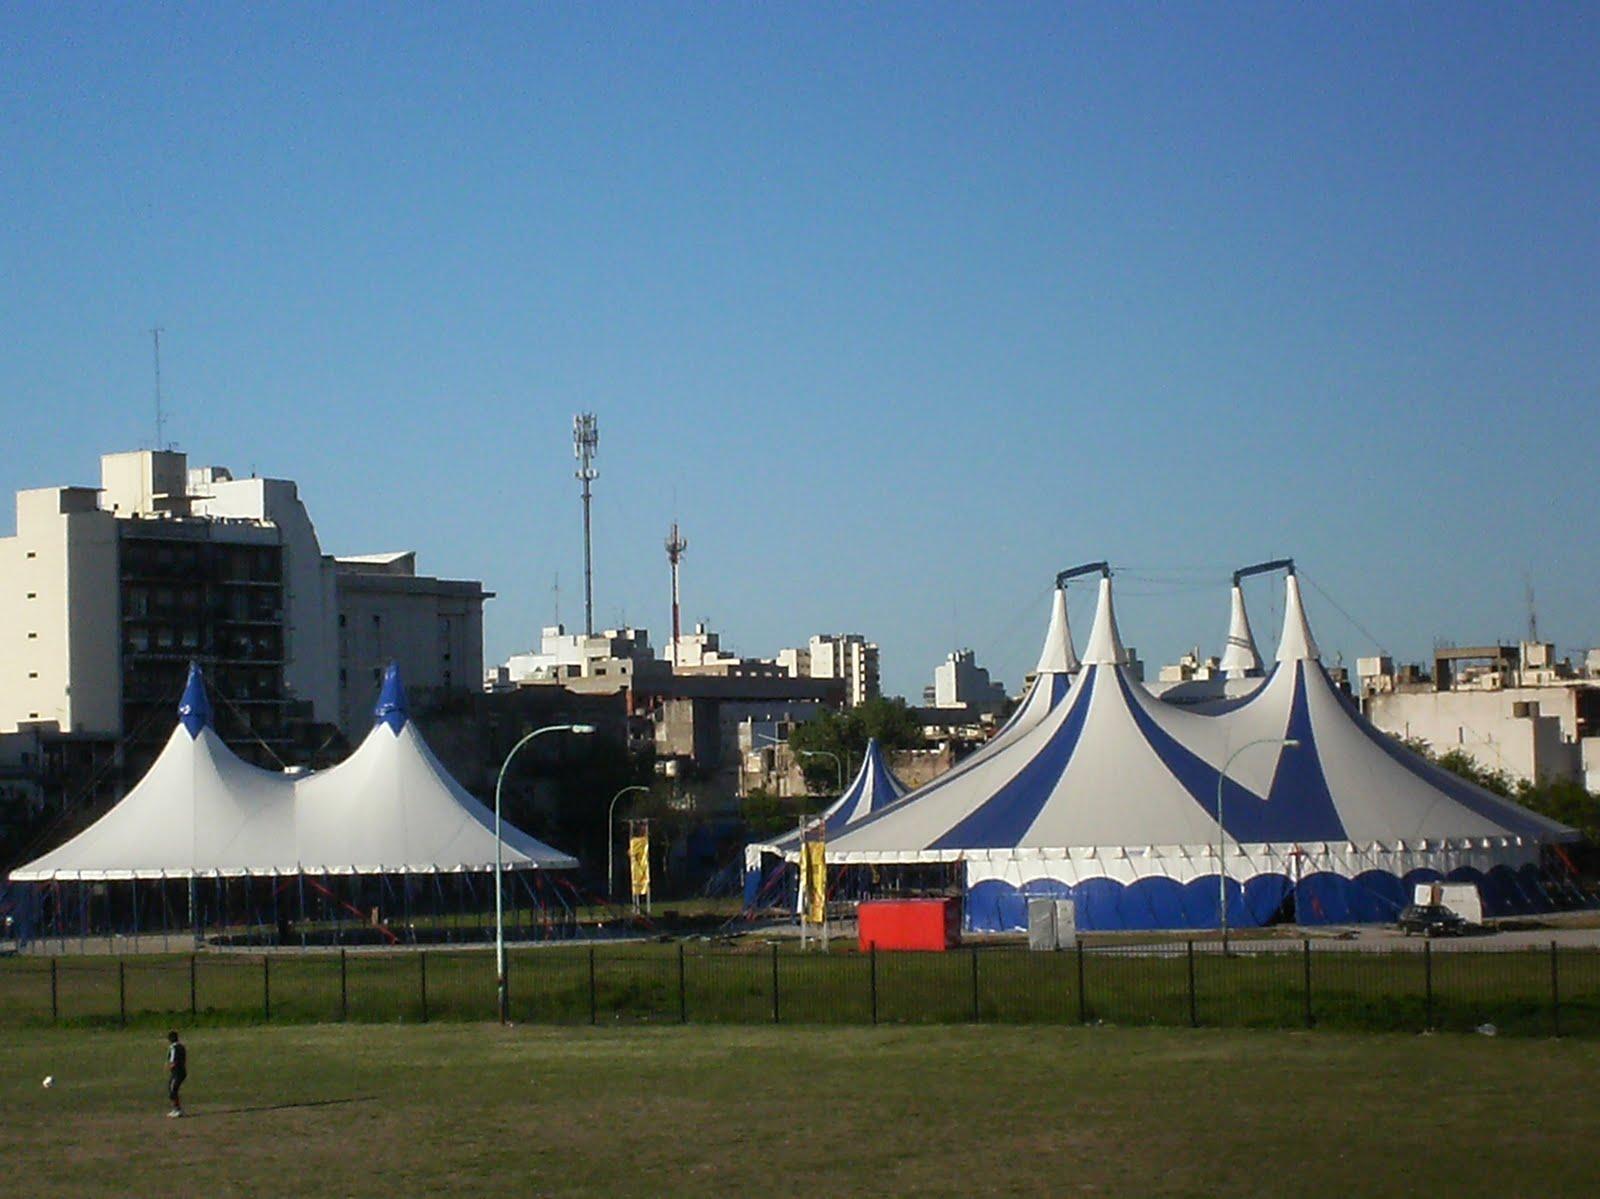 Reclaman la reapertura del Polo Circo